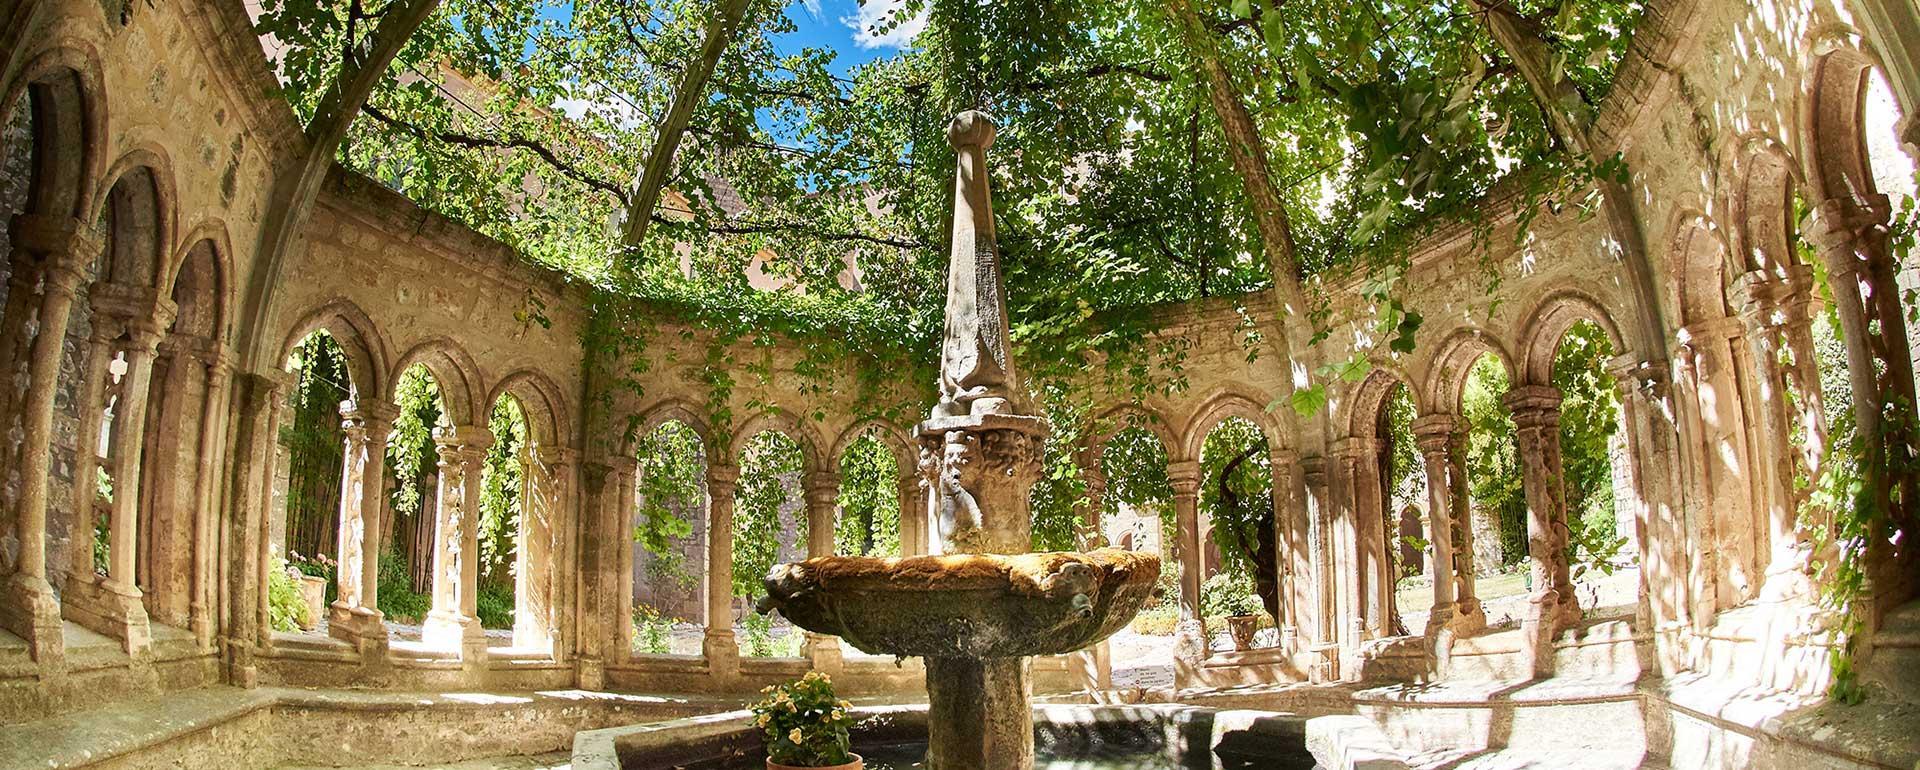 Abbaye de Valmagne © Hugo da costa